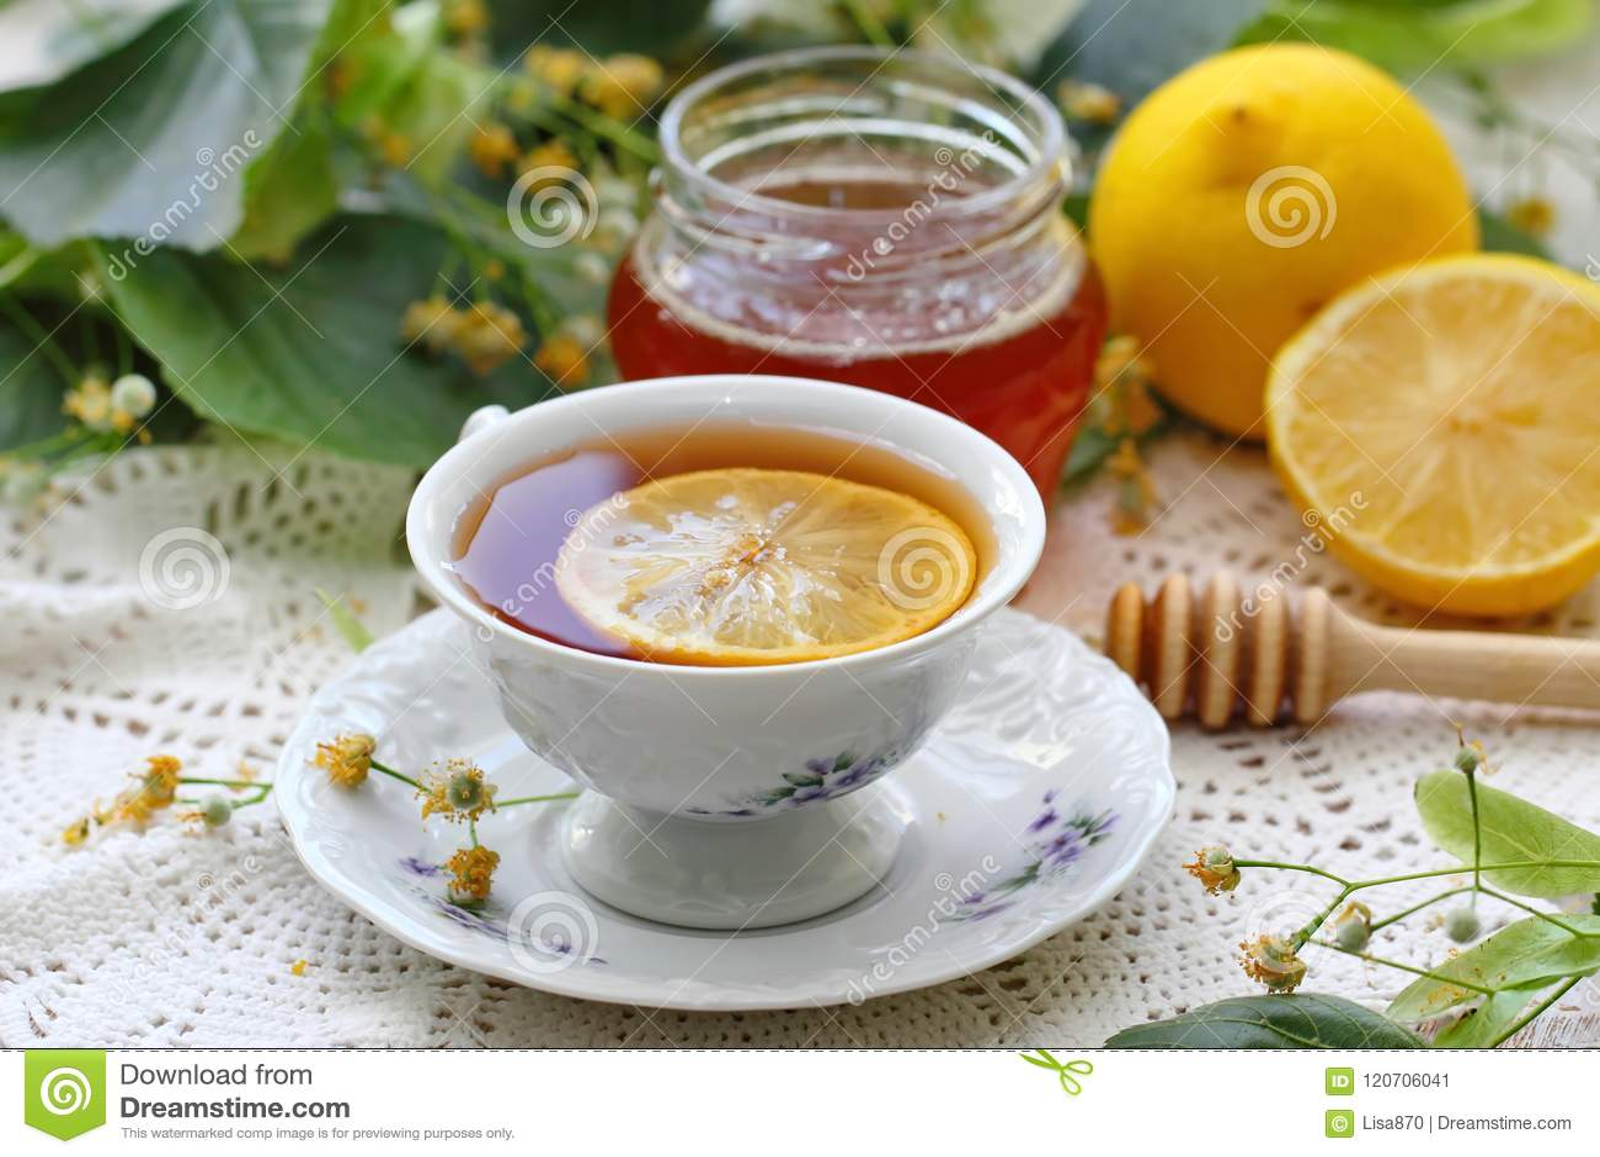 Herbal tea with linden flowers, honey and lemon